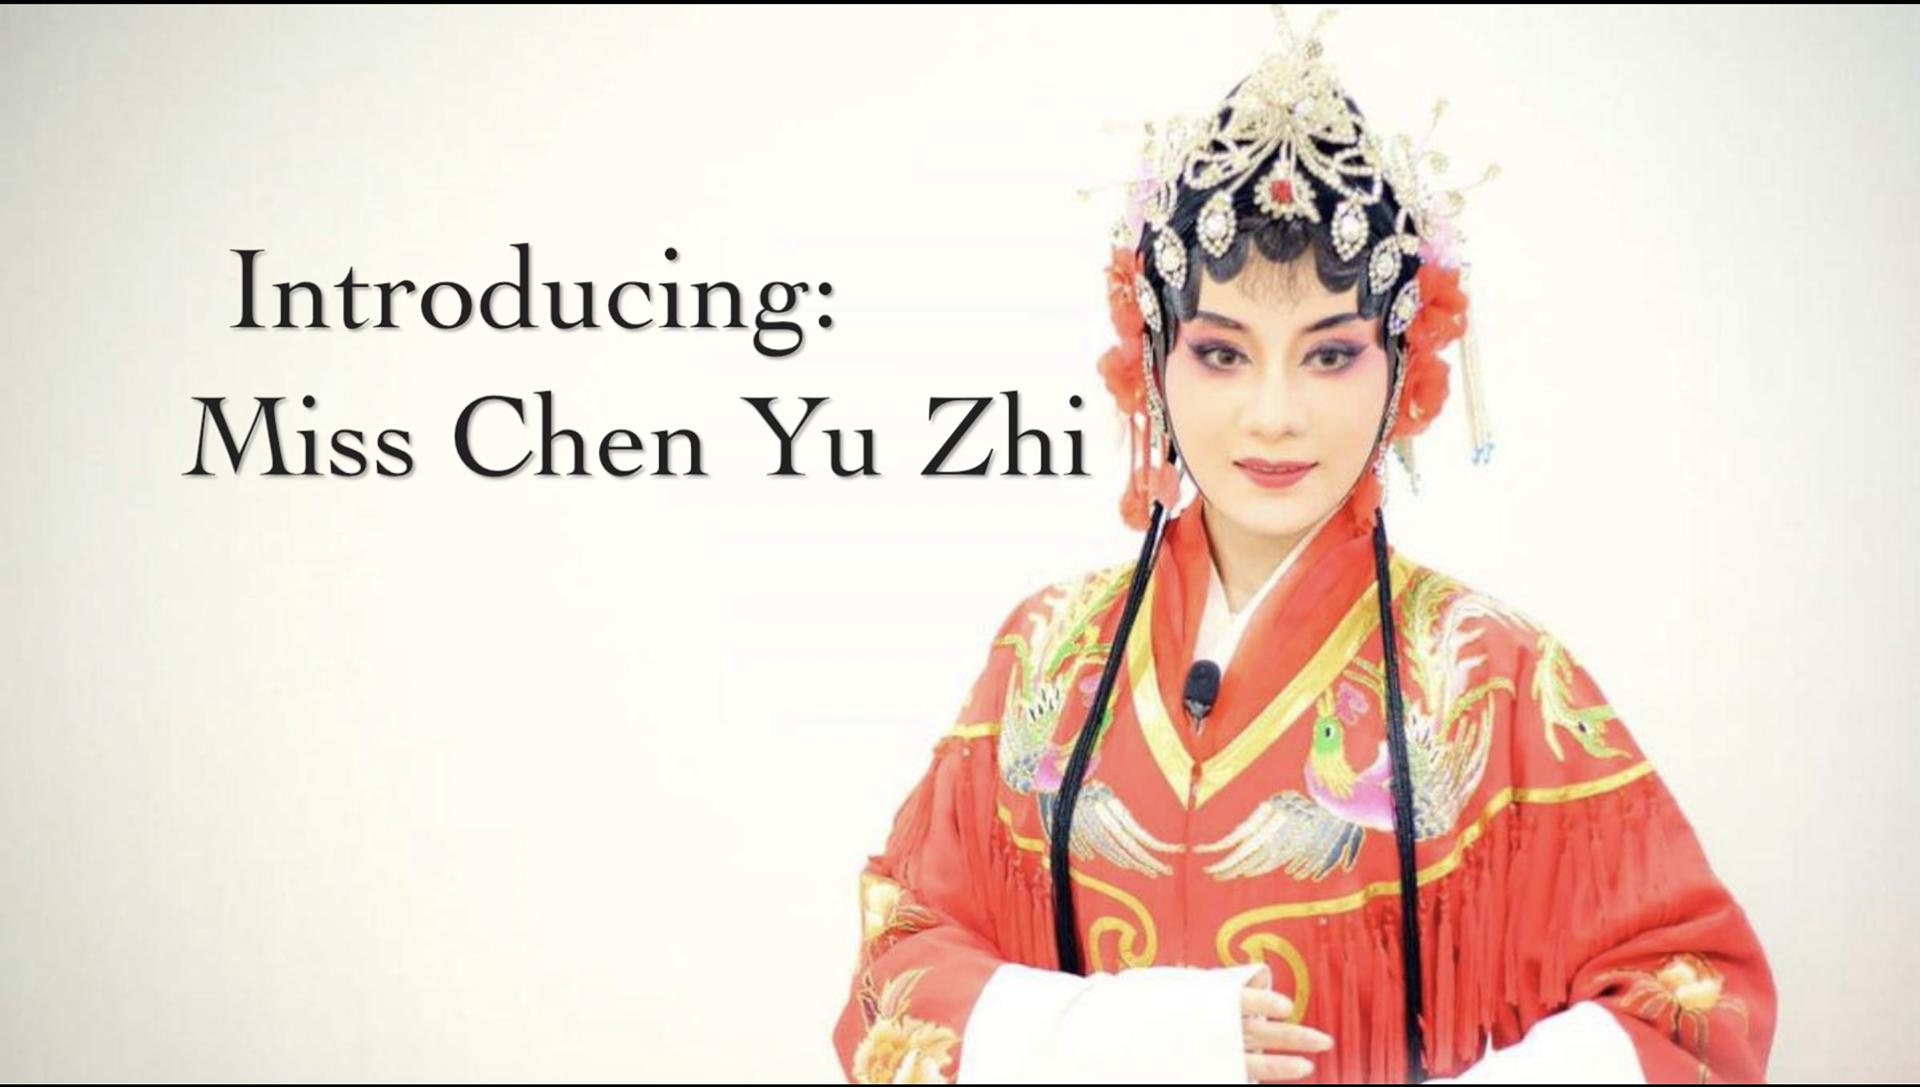 Chen Yu Zhi from Nam Hwa Opera